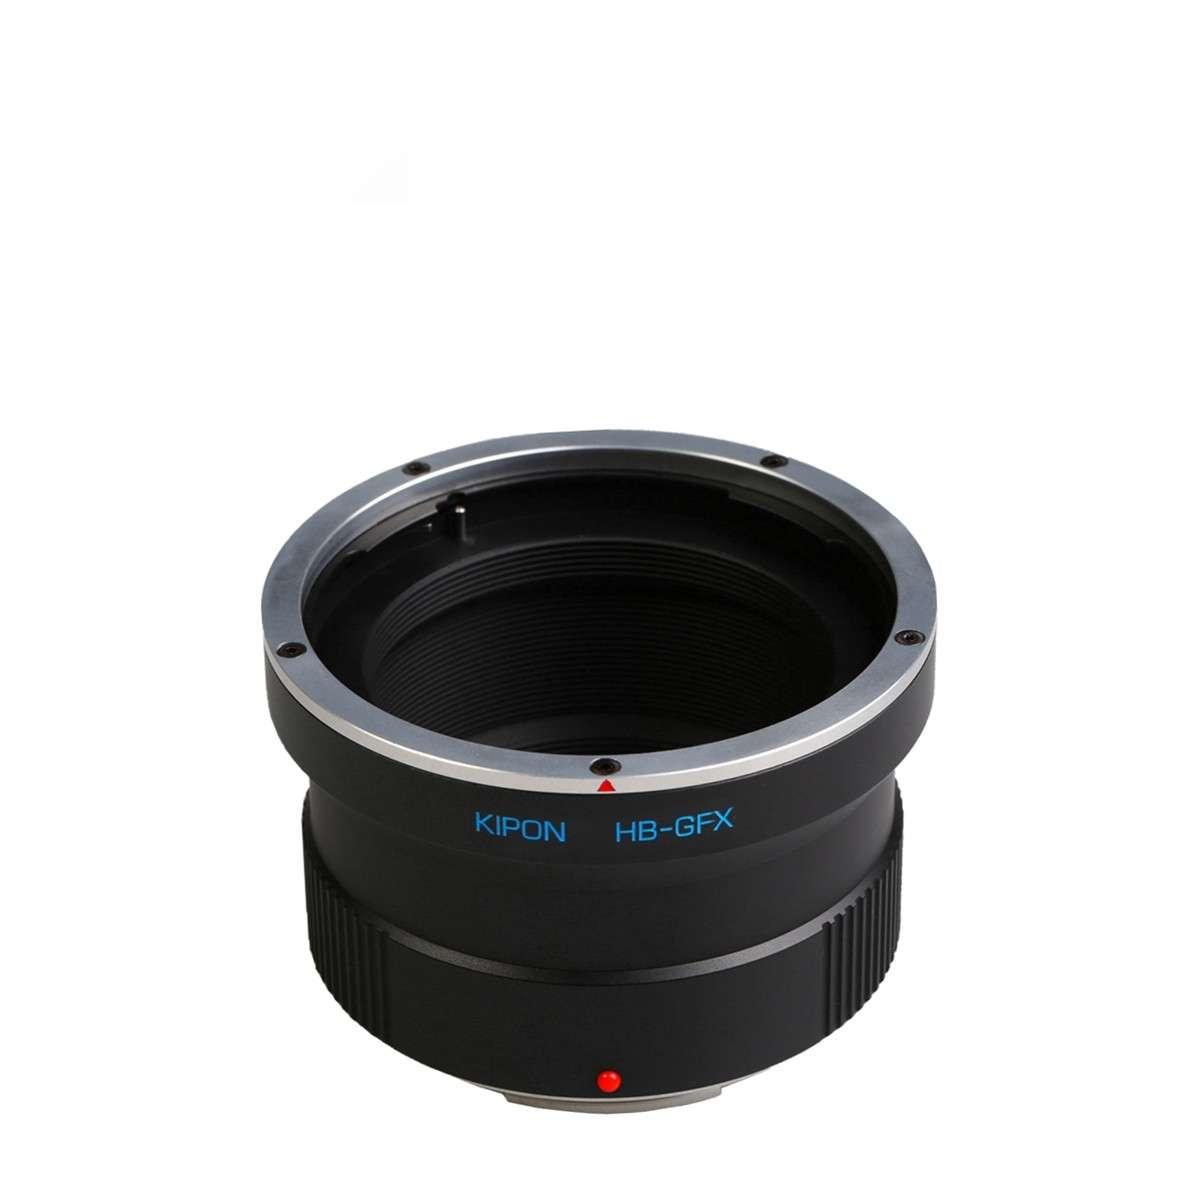 Kipon Adapter Fr Hasselblad Auf Fuji Gfx Foto Walser Mamiya 645 Mount Lens To Medium Format Camera